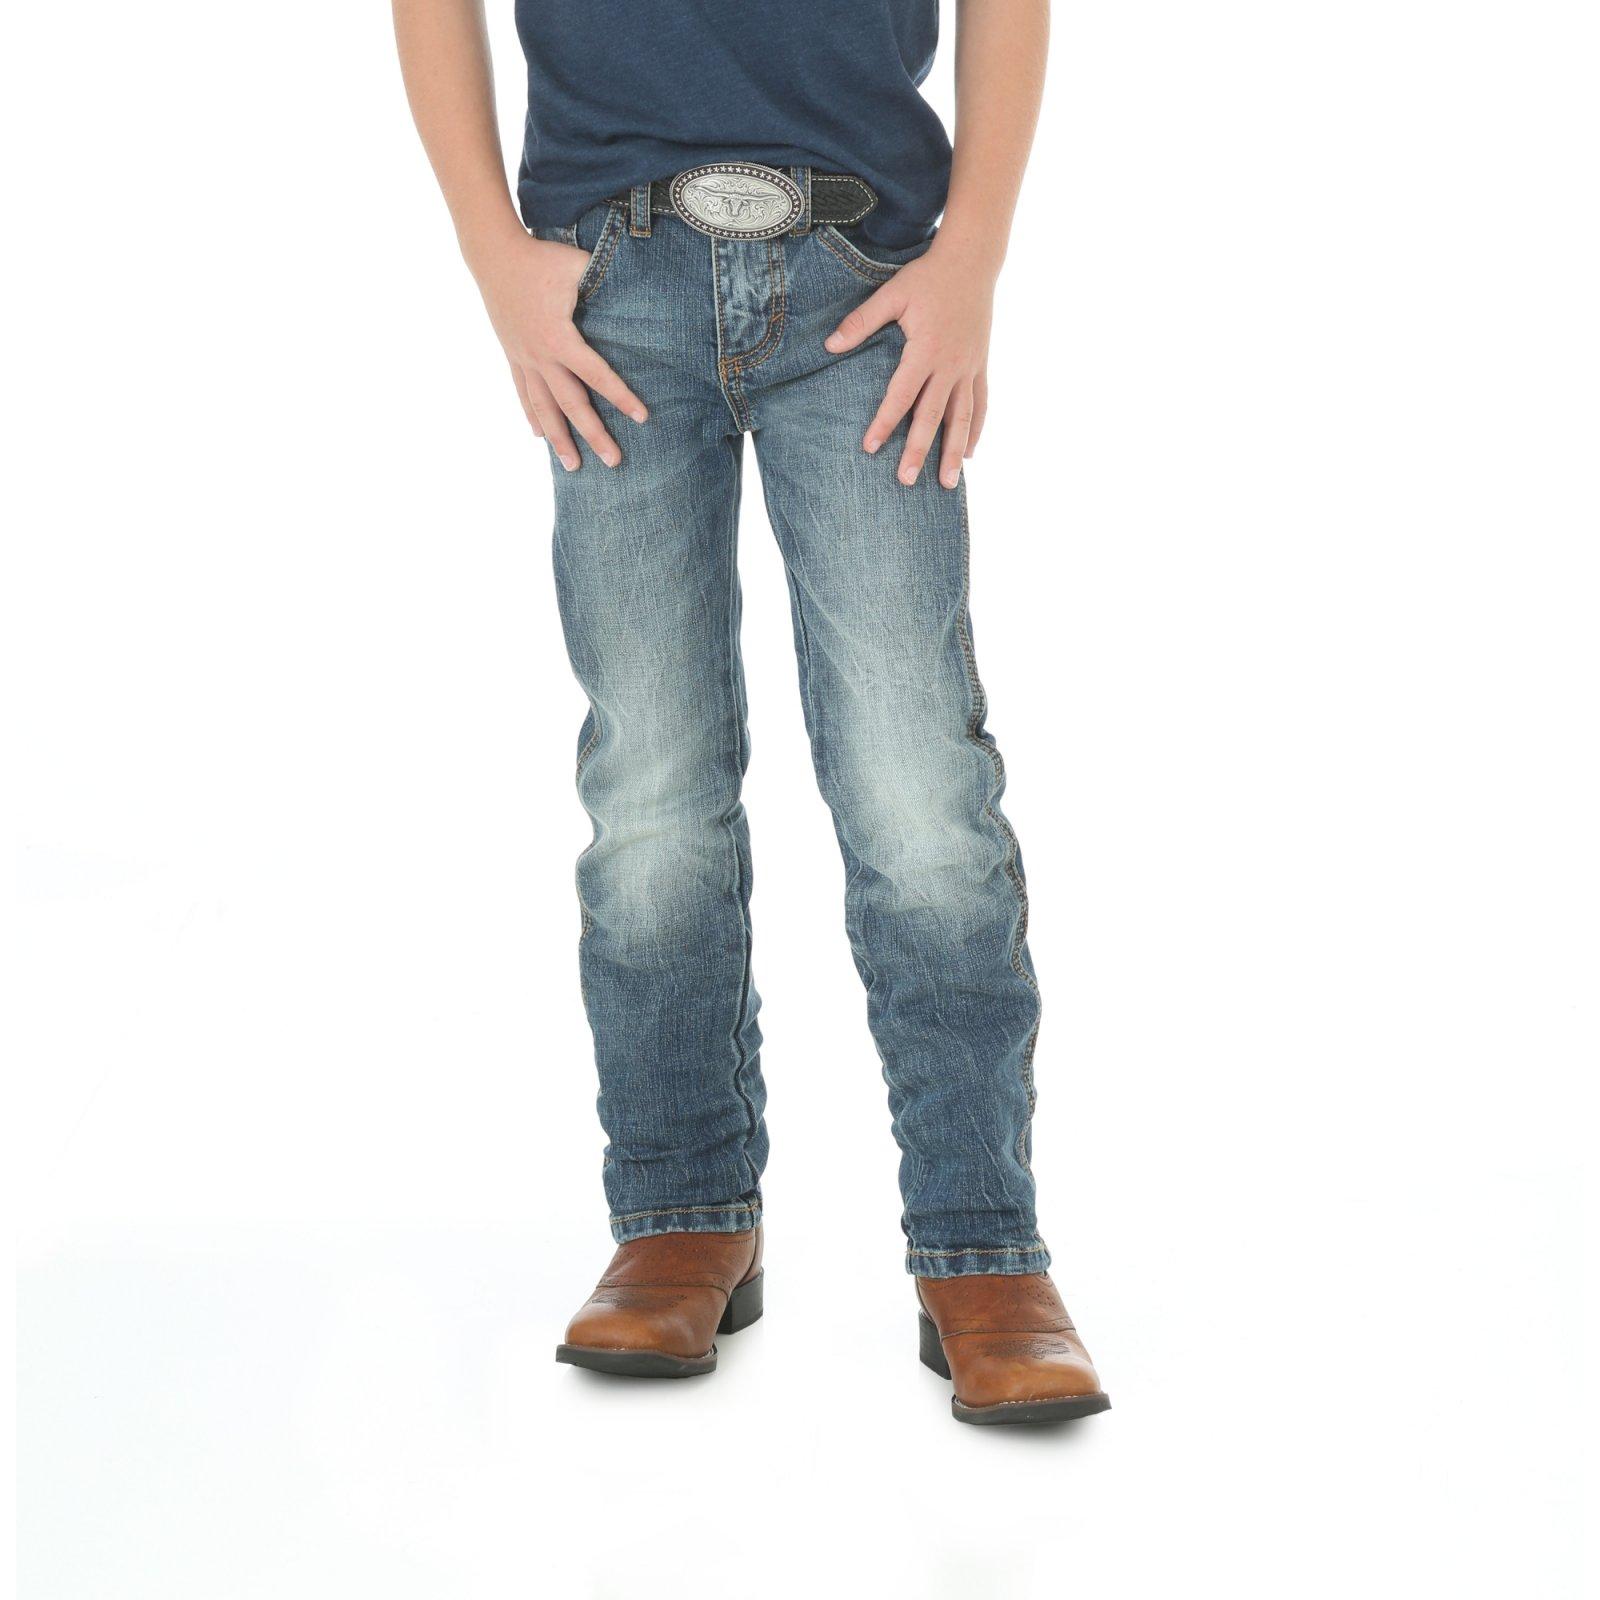 Retro Slim Straight from Wrangler - Slim fit